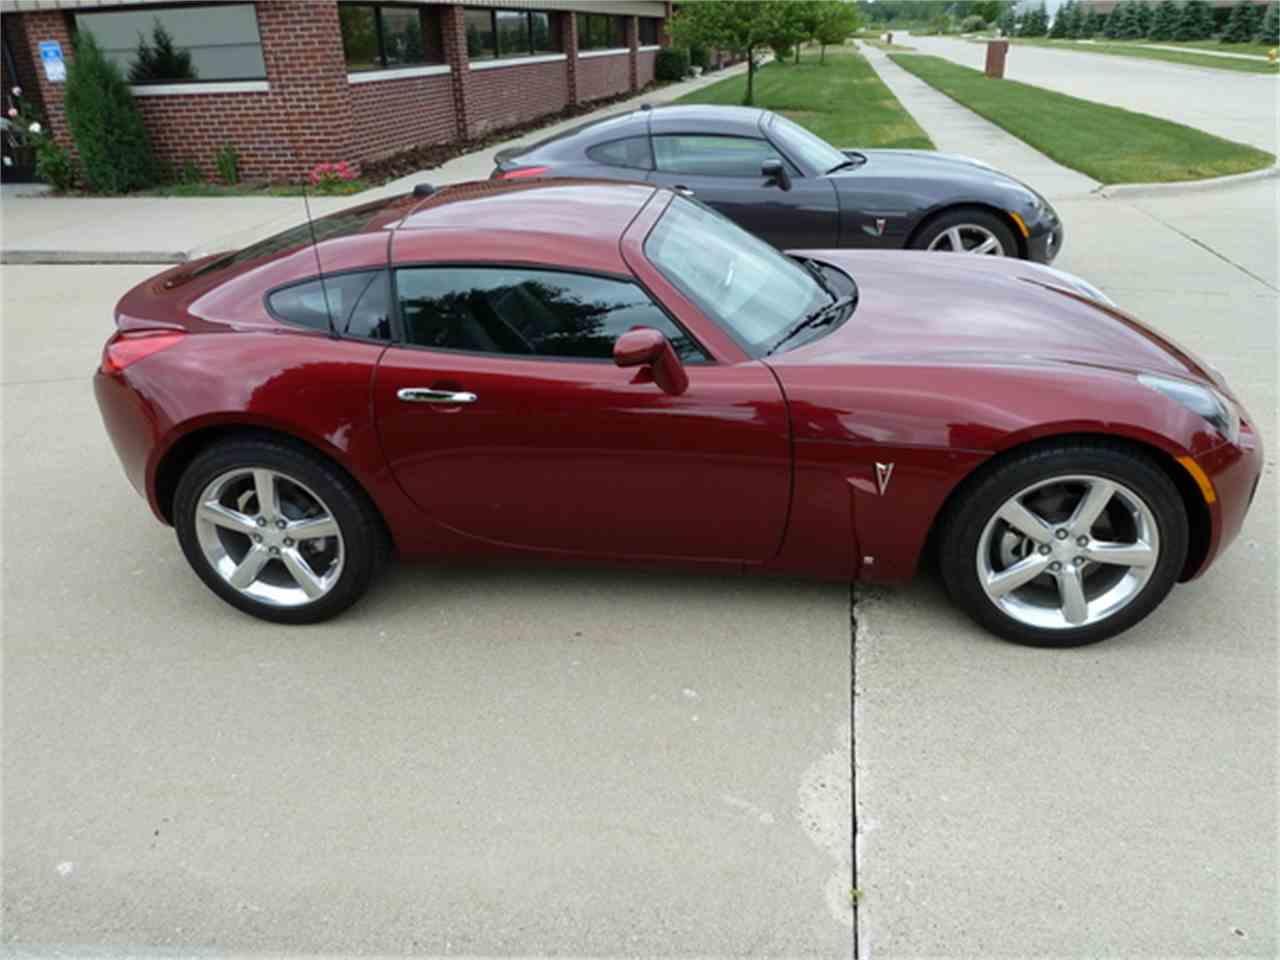 2010 Pontiac Solstice for Sale - CC-898794